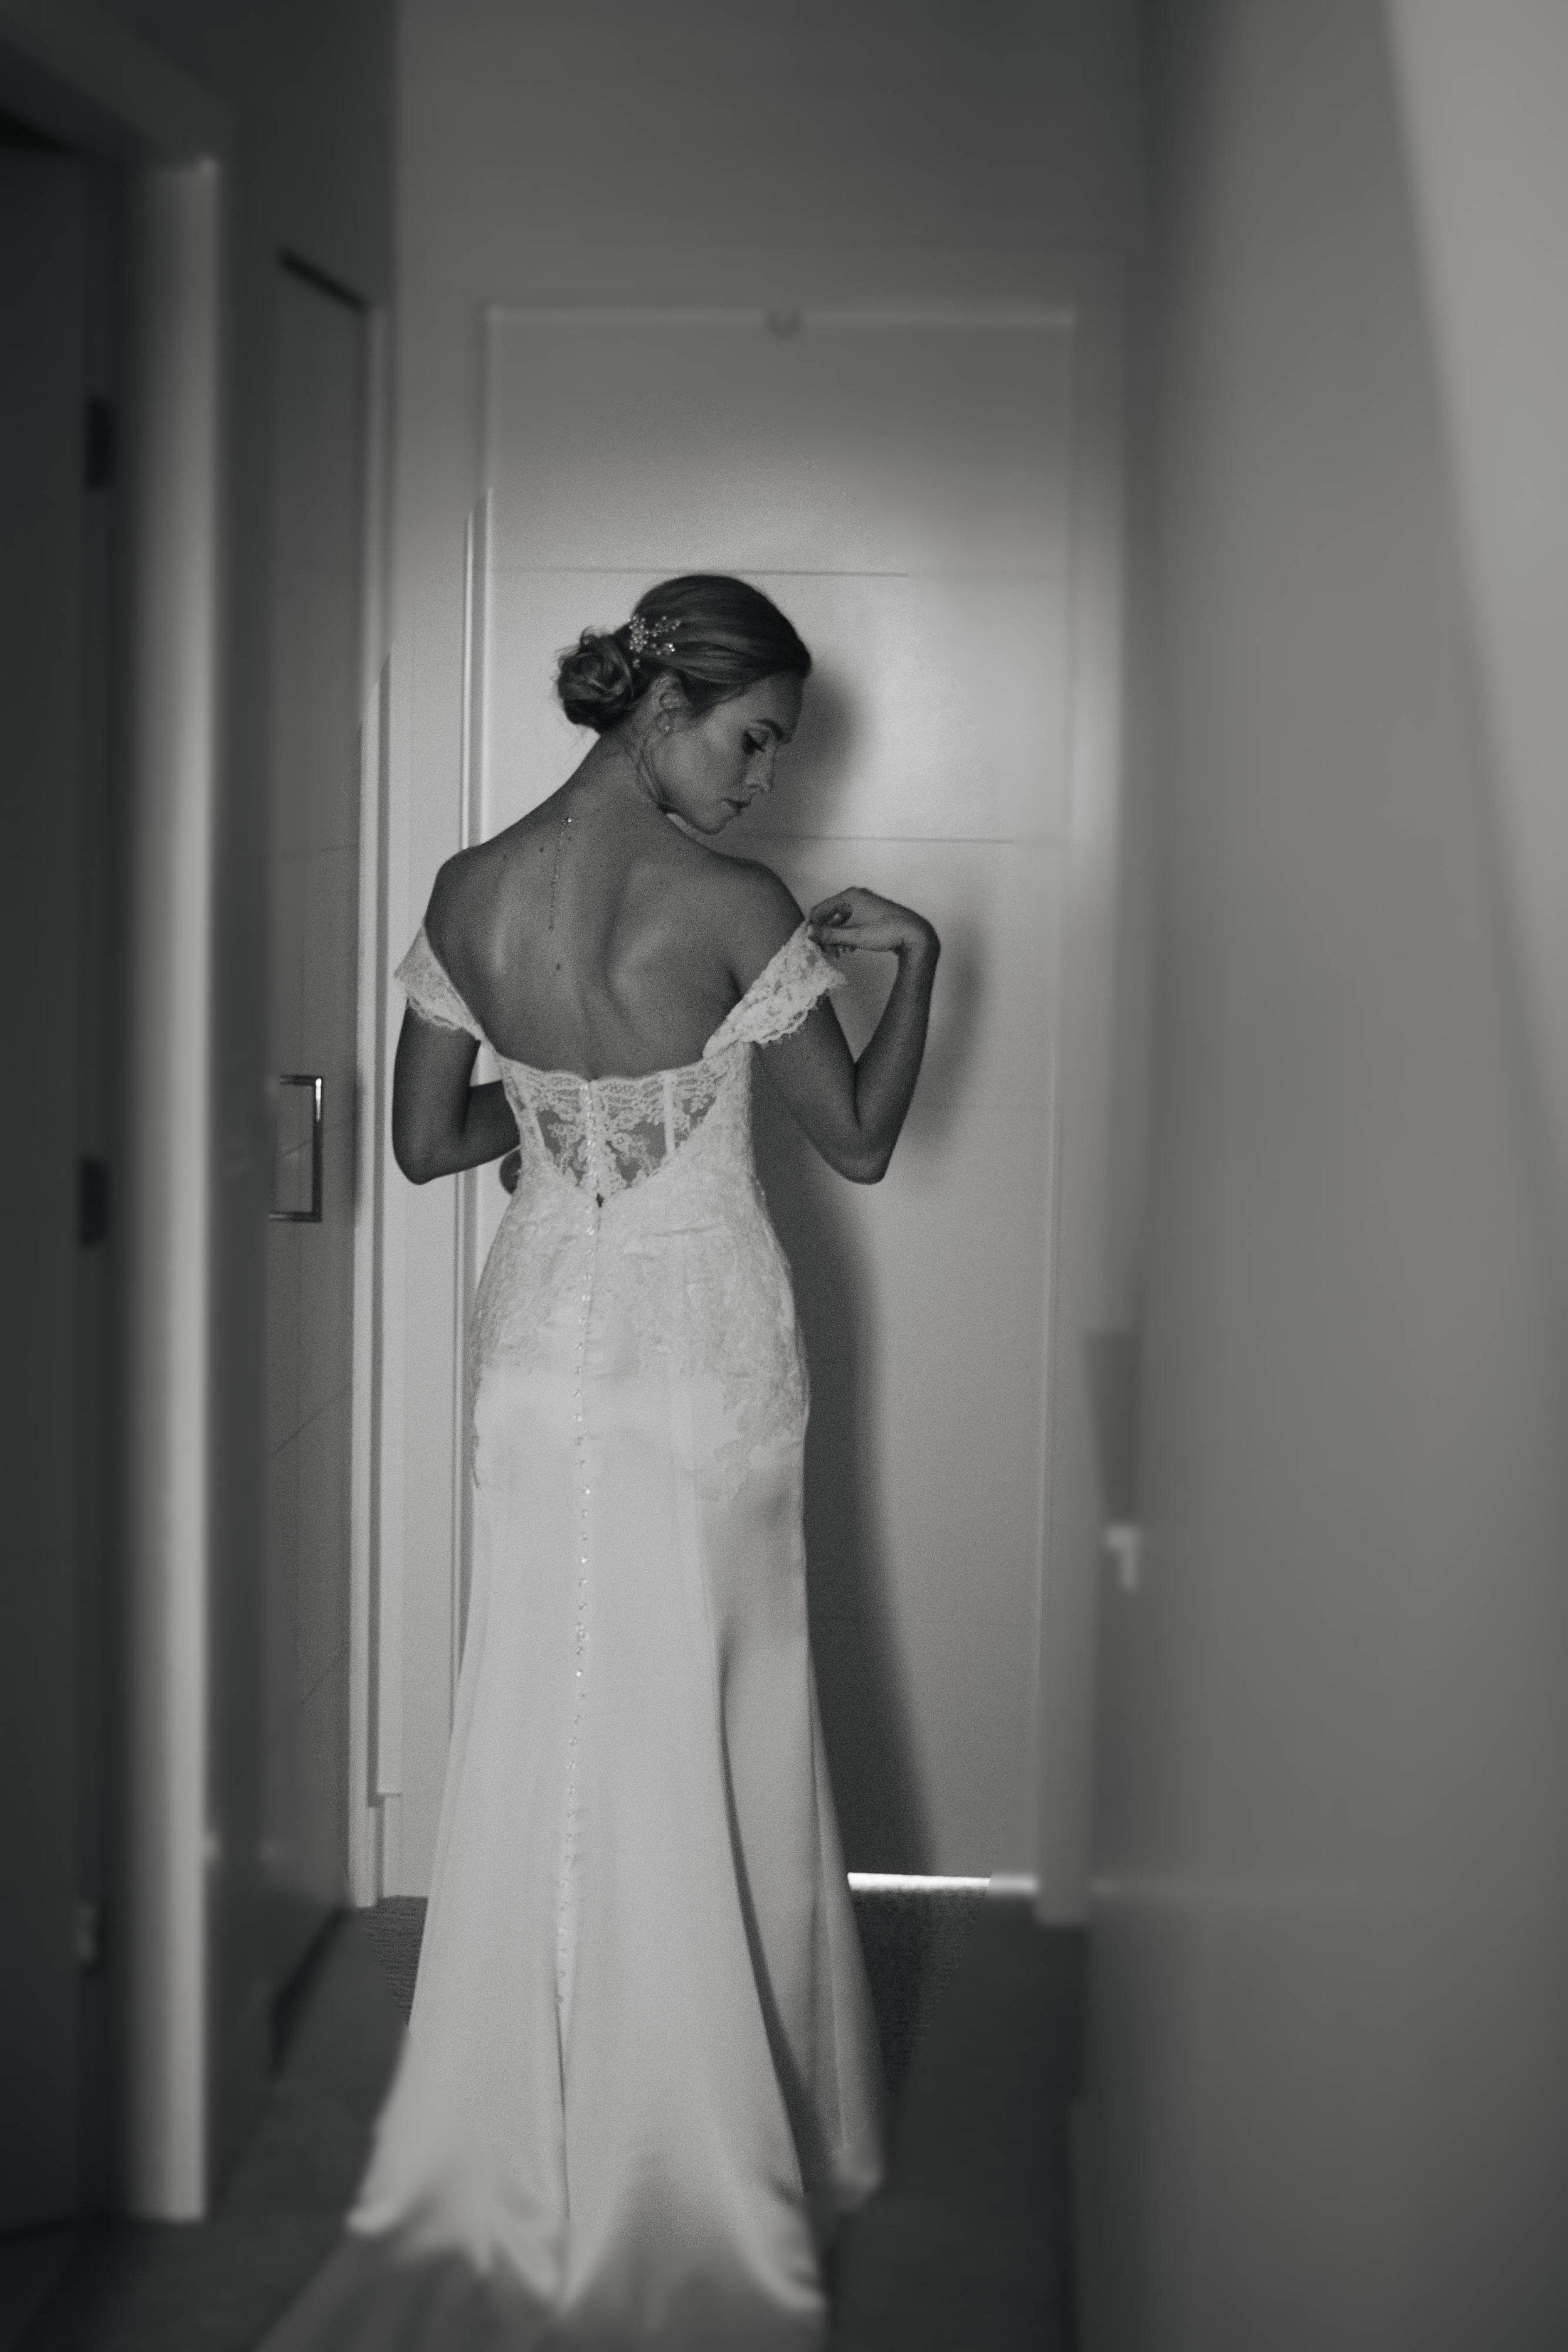 jenna-getting-married-113.jpg